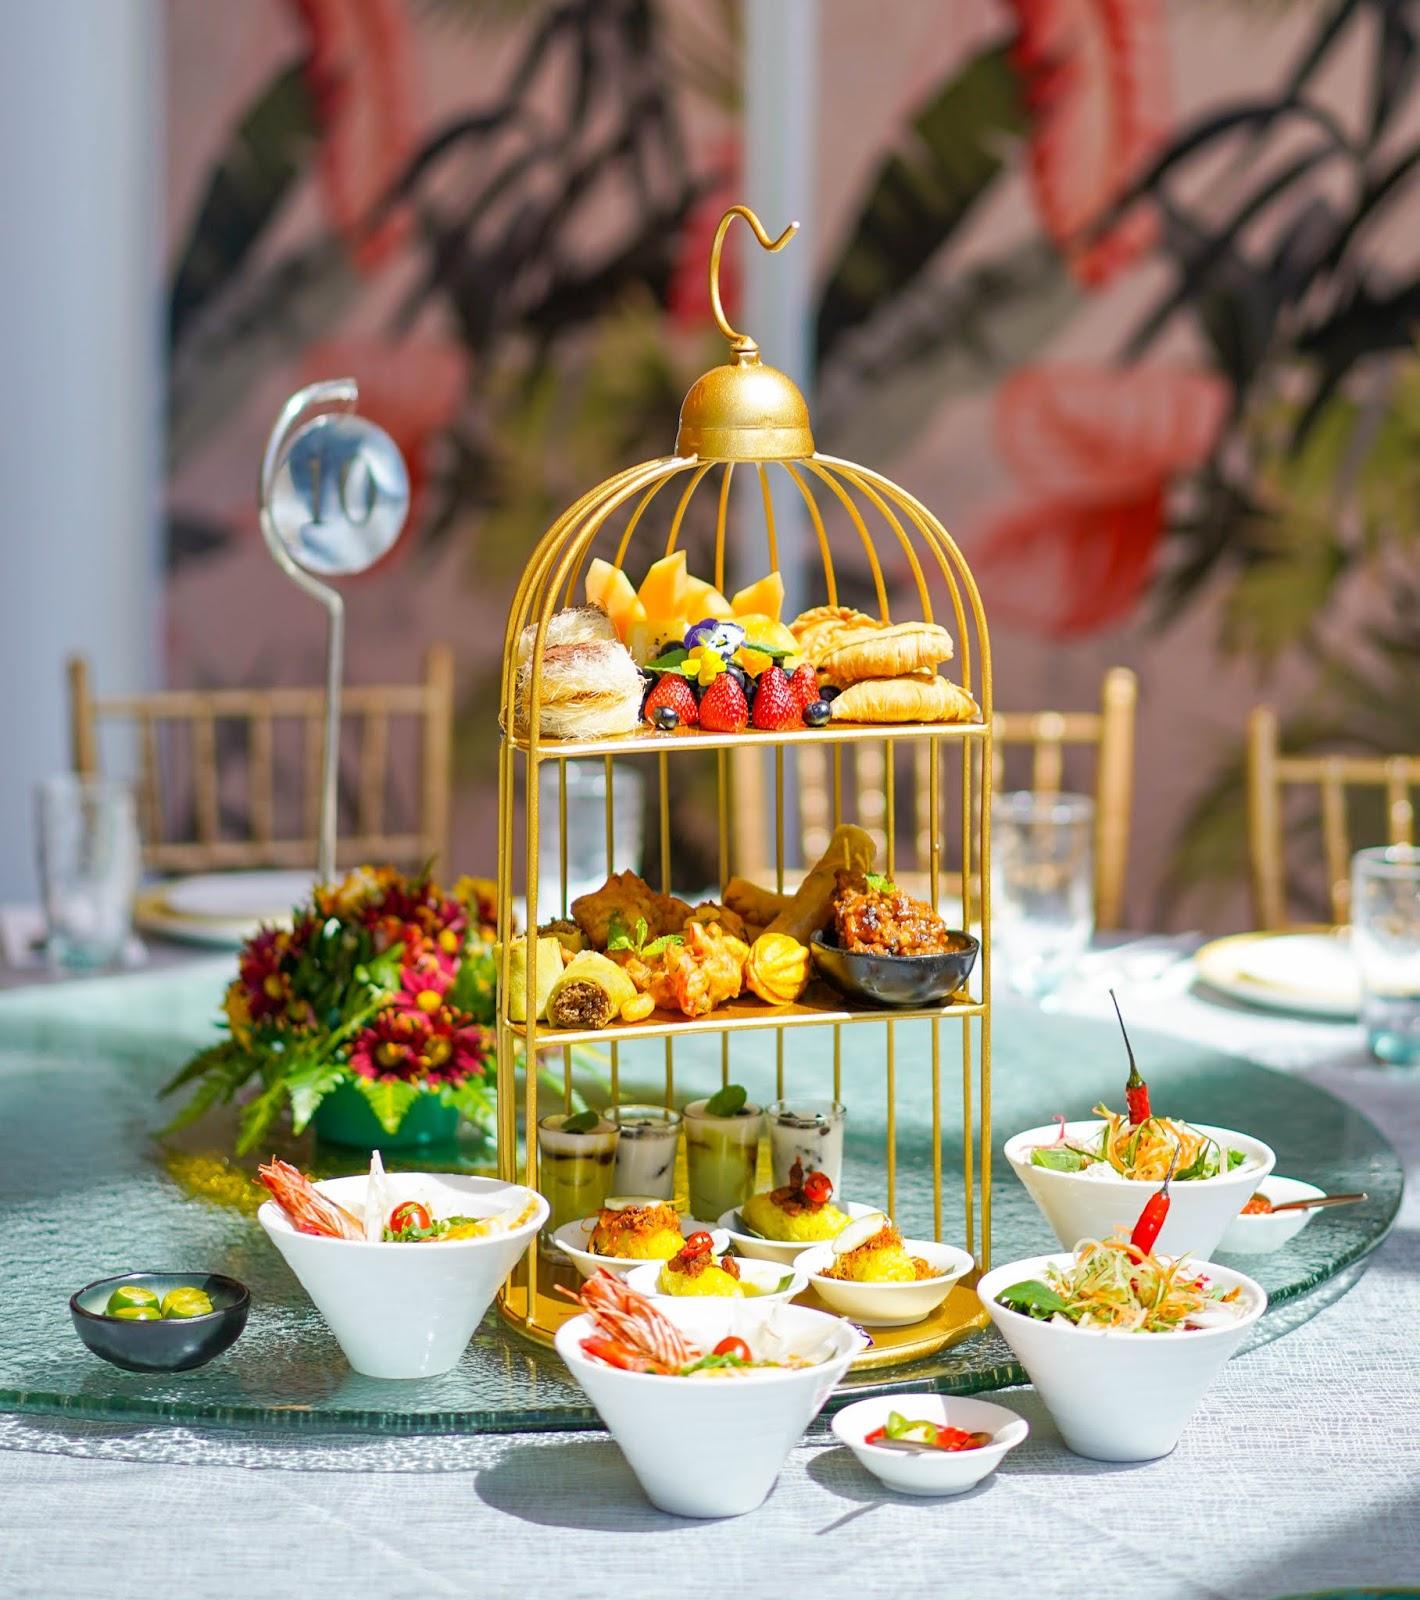 De.Wan 1958 by Chef Wan: High Tea Set & Malaysian Tea Delights Menu